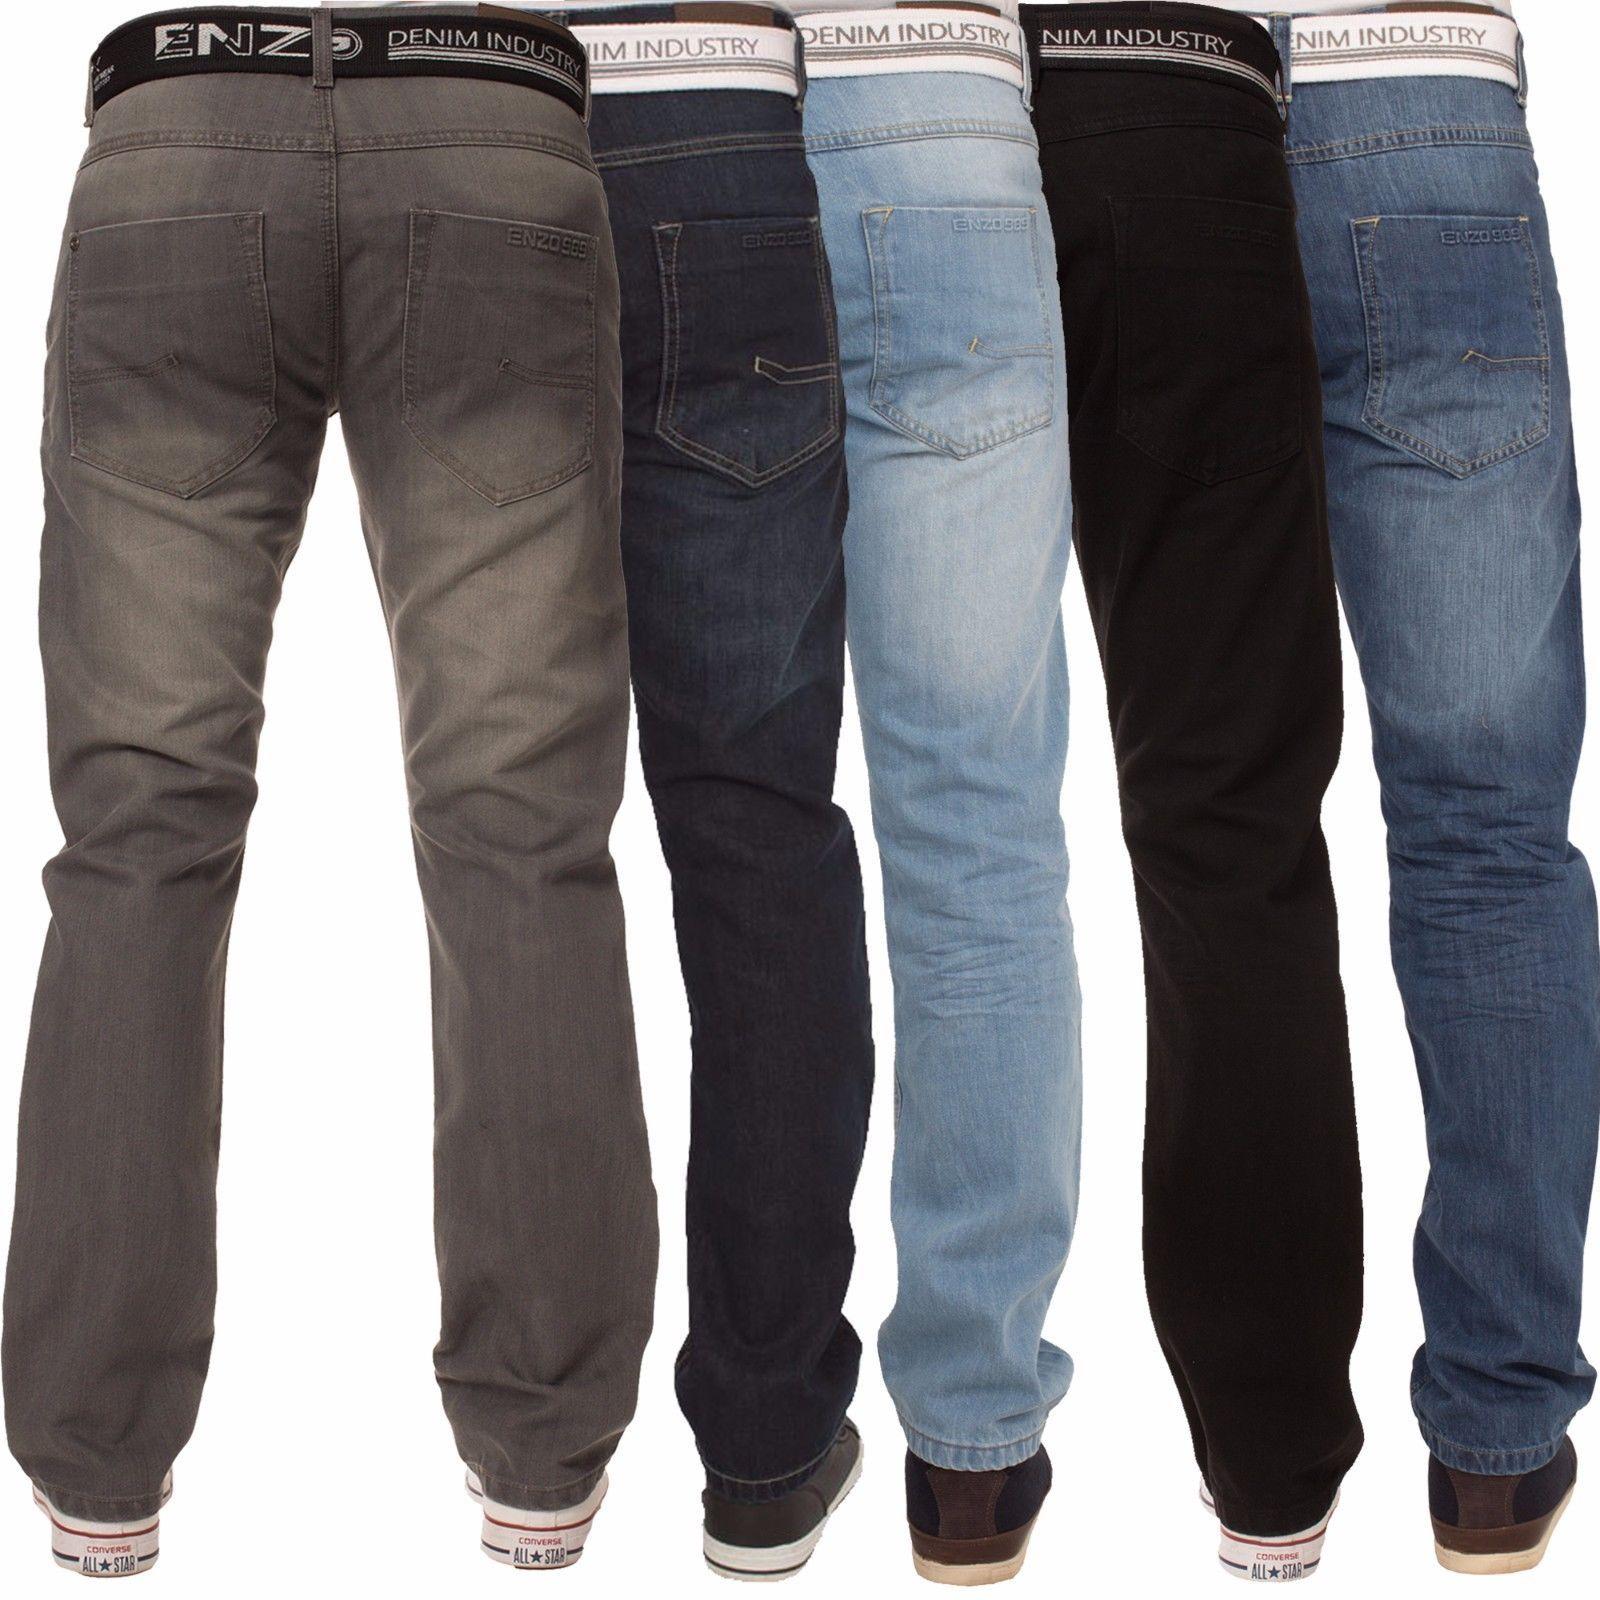 Mens Boy Jeans Straight Leg Denim Pants Skinny Stretch Fit Ripped All Waist Legs